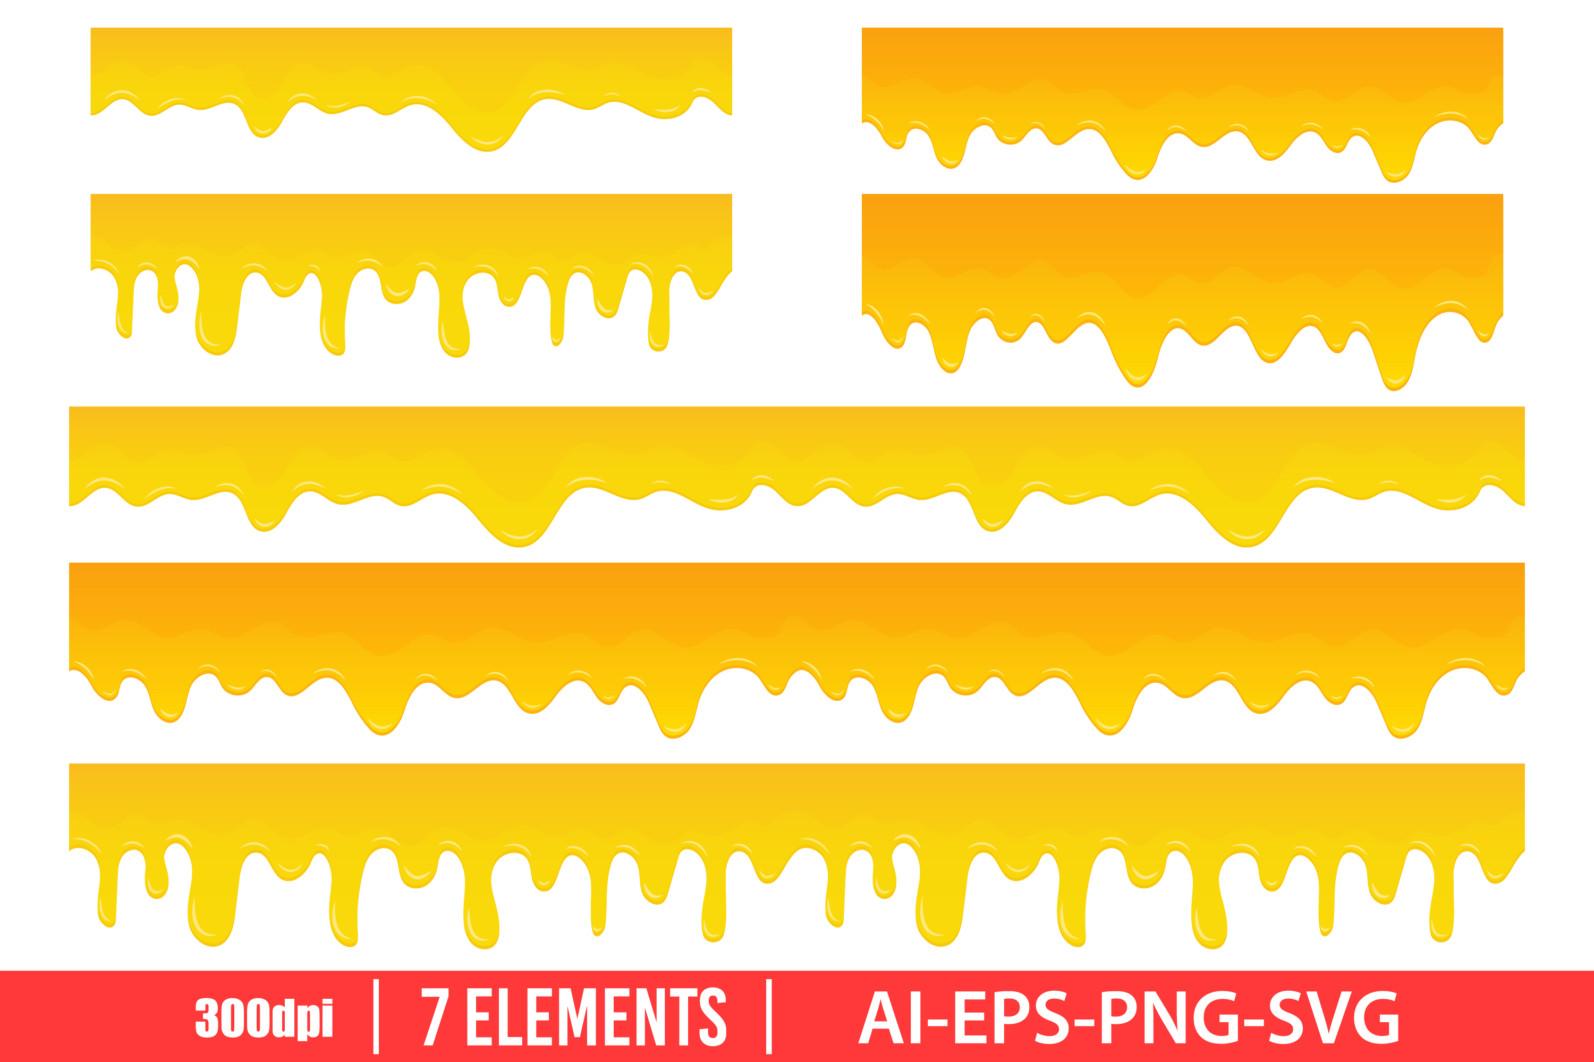 Honey dripping clipart vector design illustration. Honey set. Vector Clipart Print - HONEY scaled -